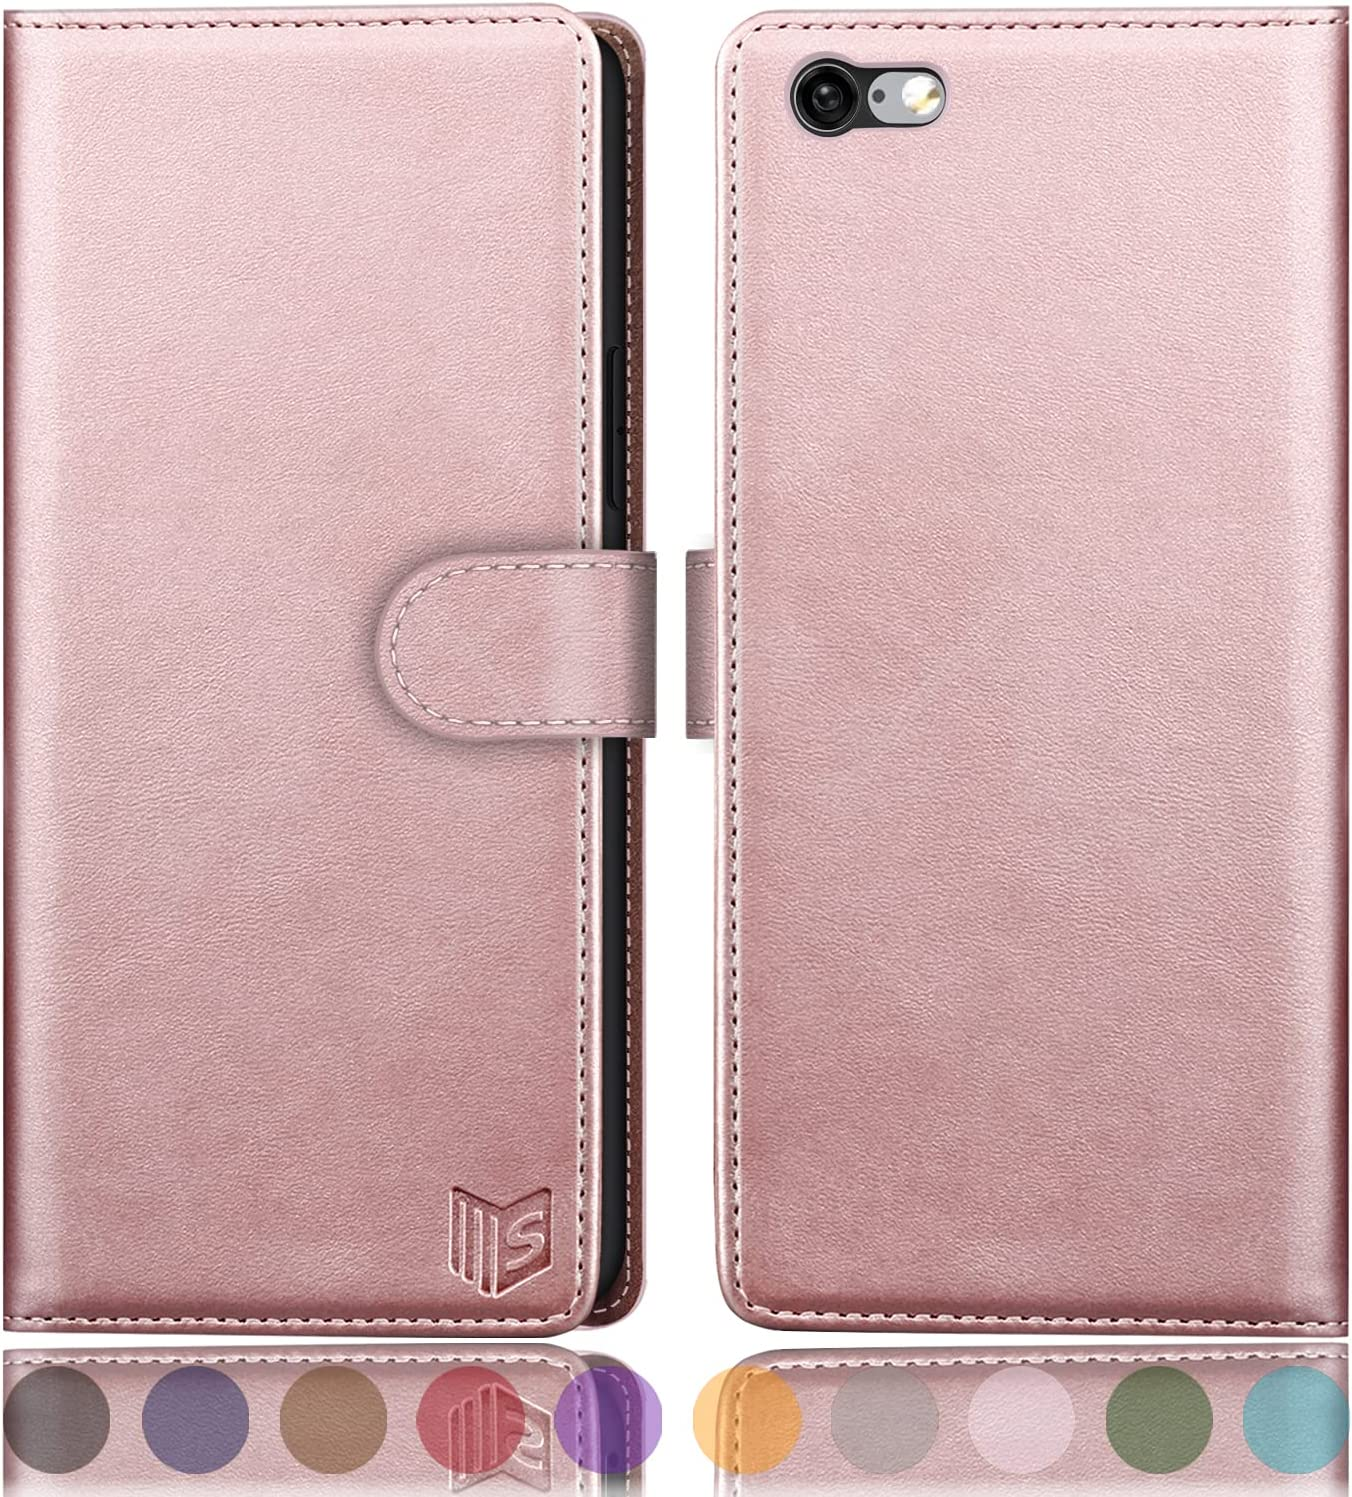 SUANPOT for iPhone 6 Plus / 6S Plus 5.5